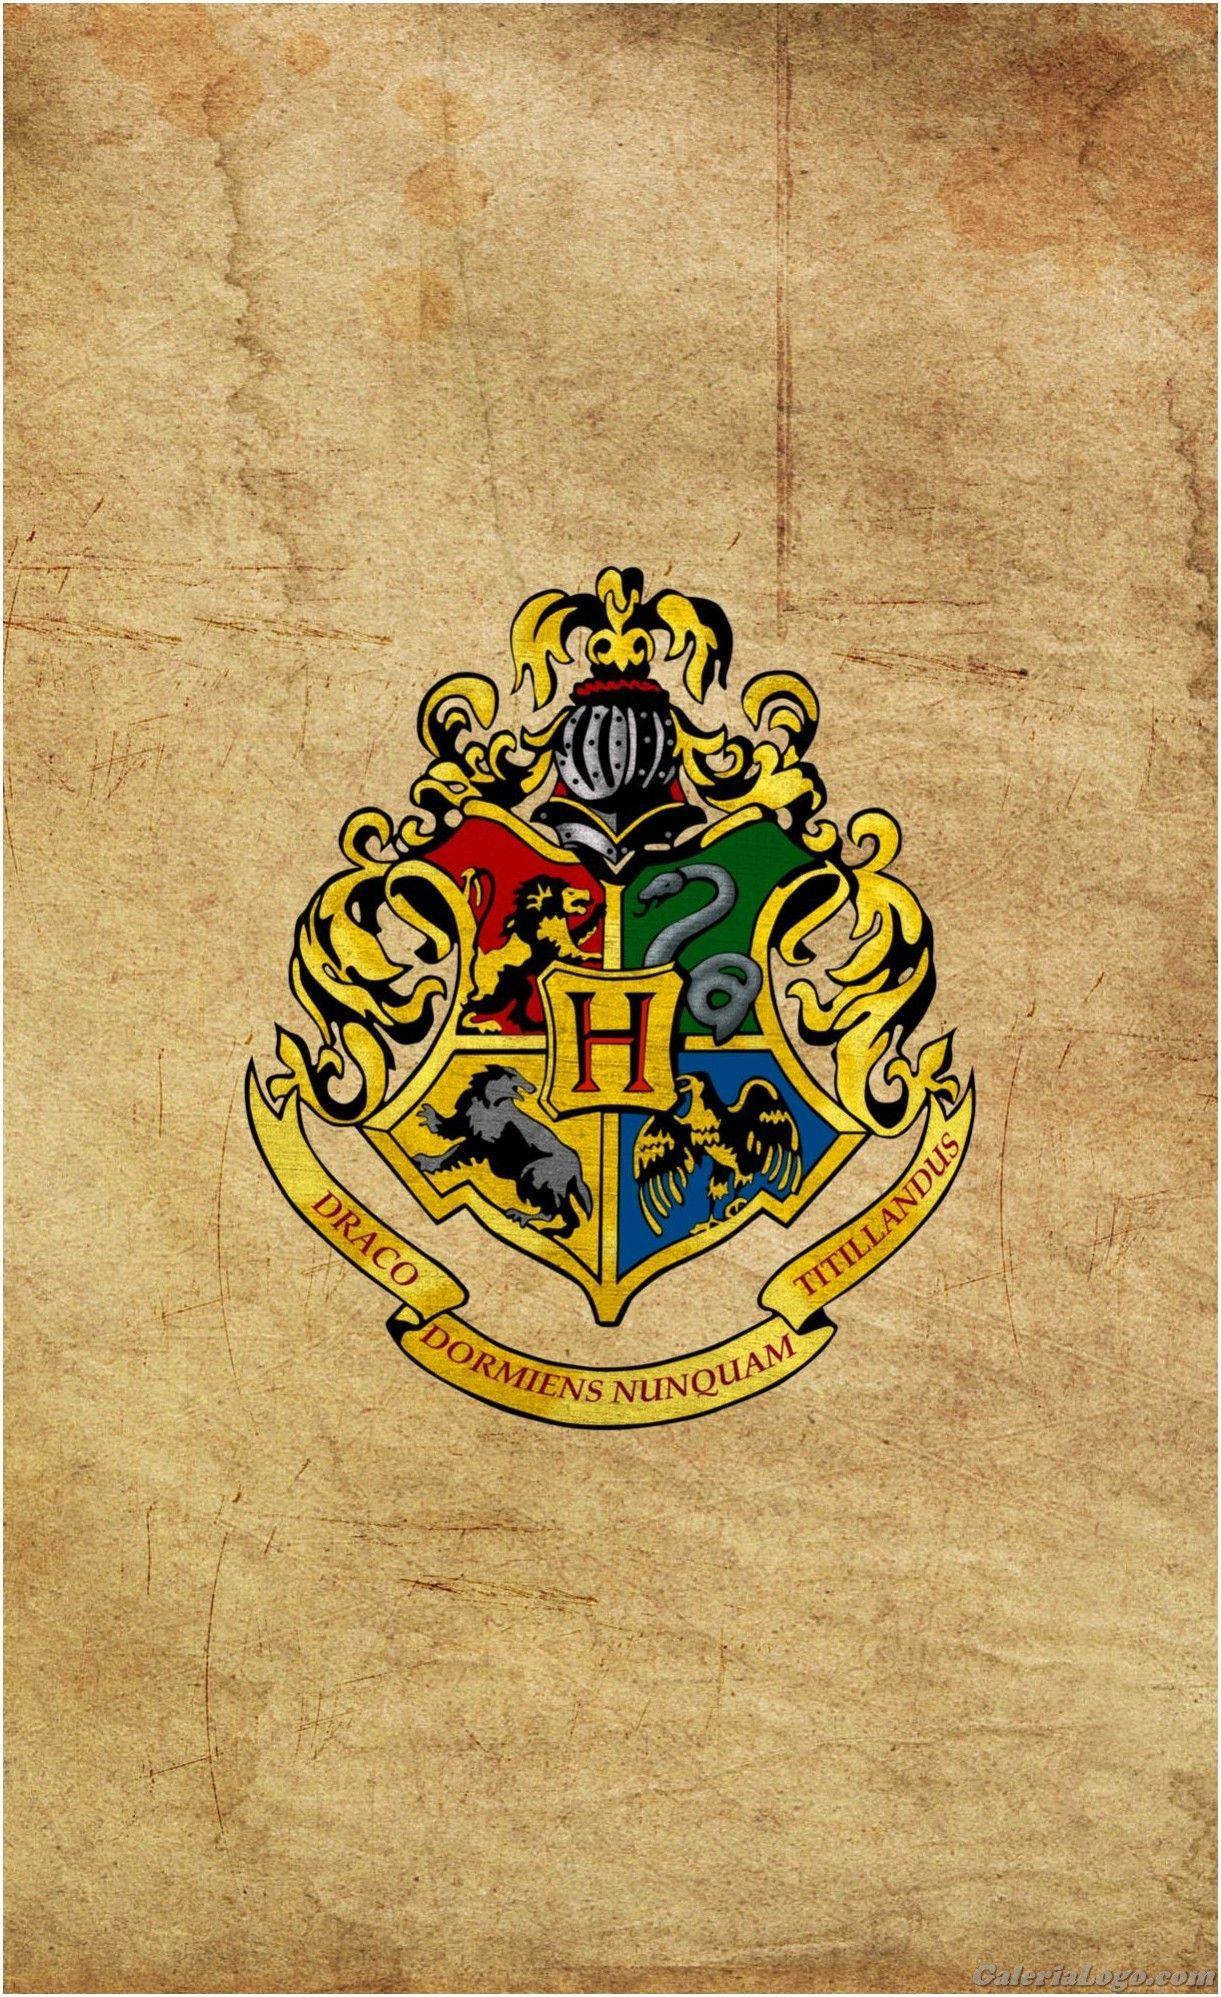 720x1280 19 Best Wallpaper Images On Pinterest Hogwarts Harry Potter Art